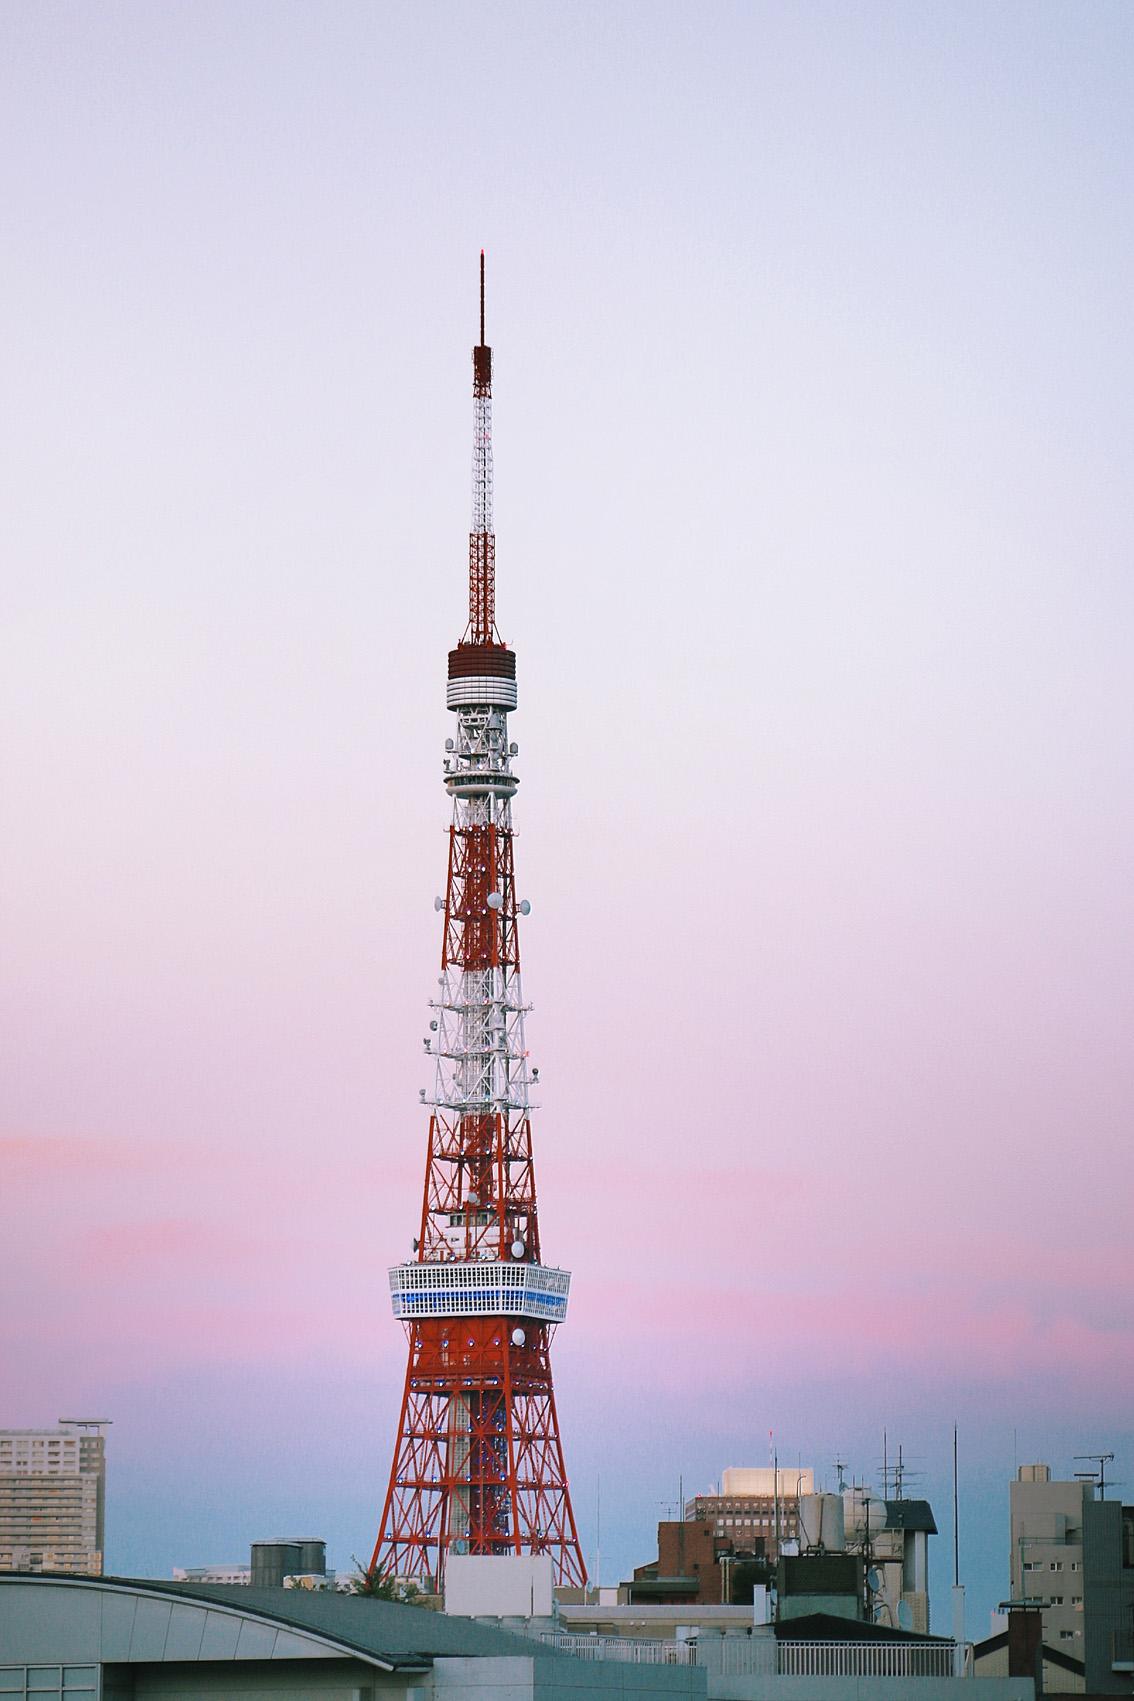 13-1 Giappotour: last day in Tokyo. Ueno, Ginza, Akihabara and Roppongi Hills.